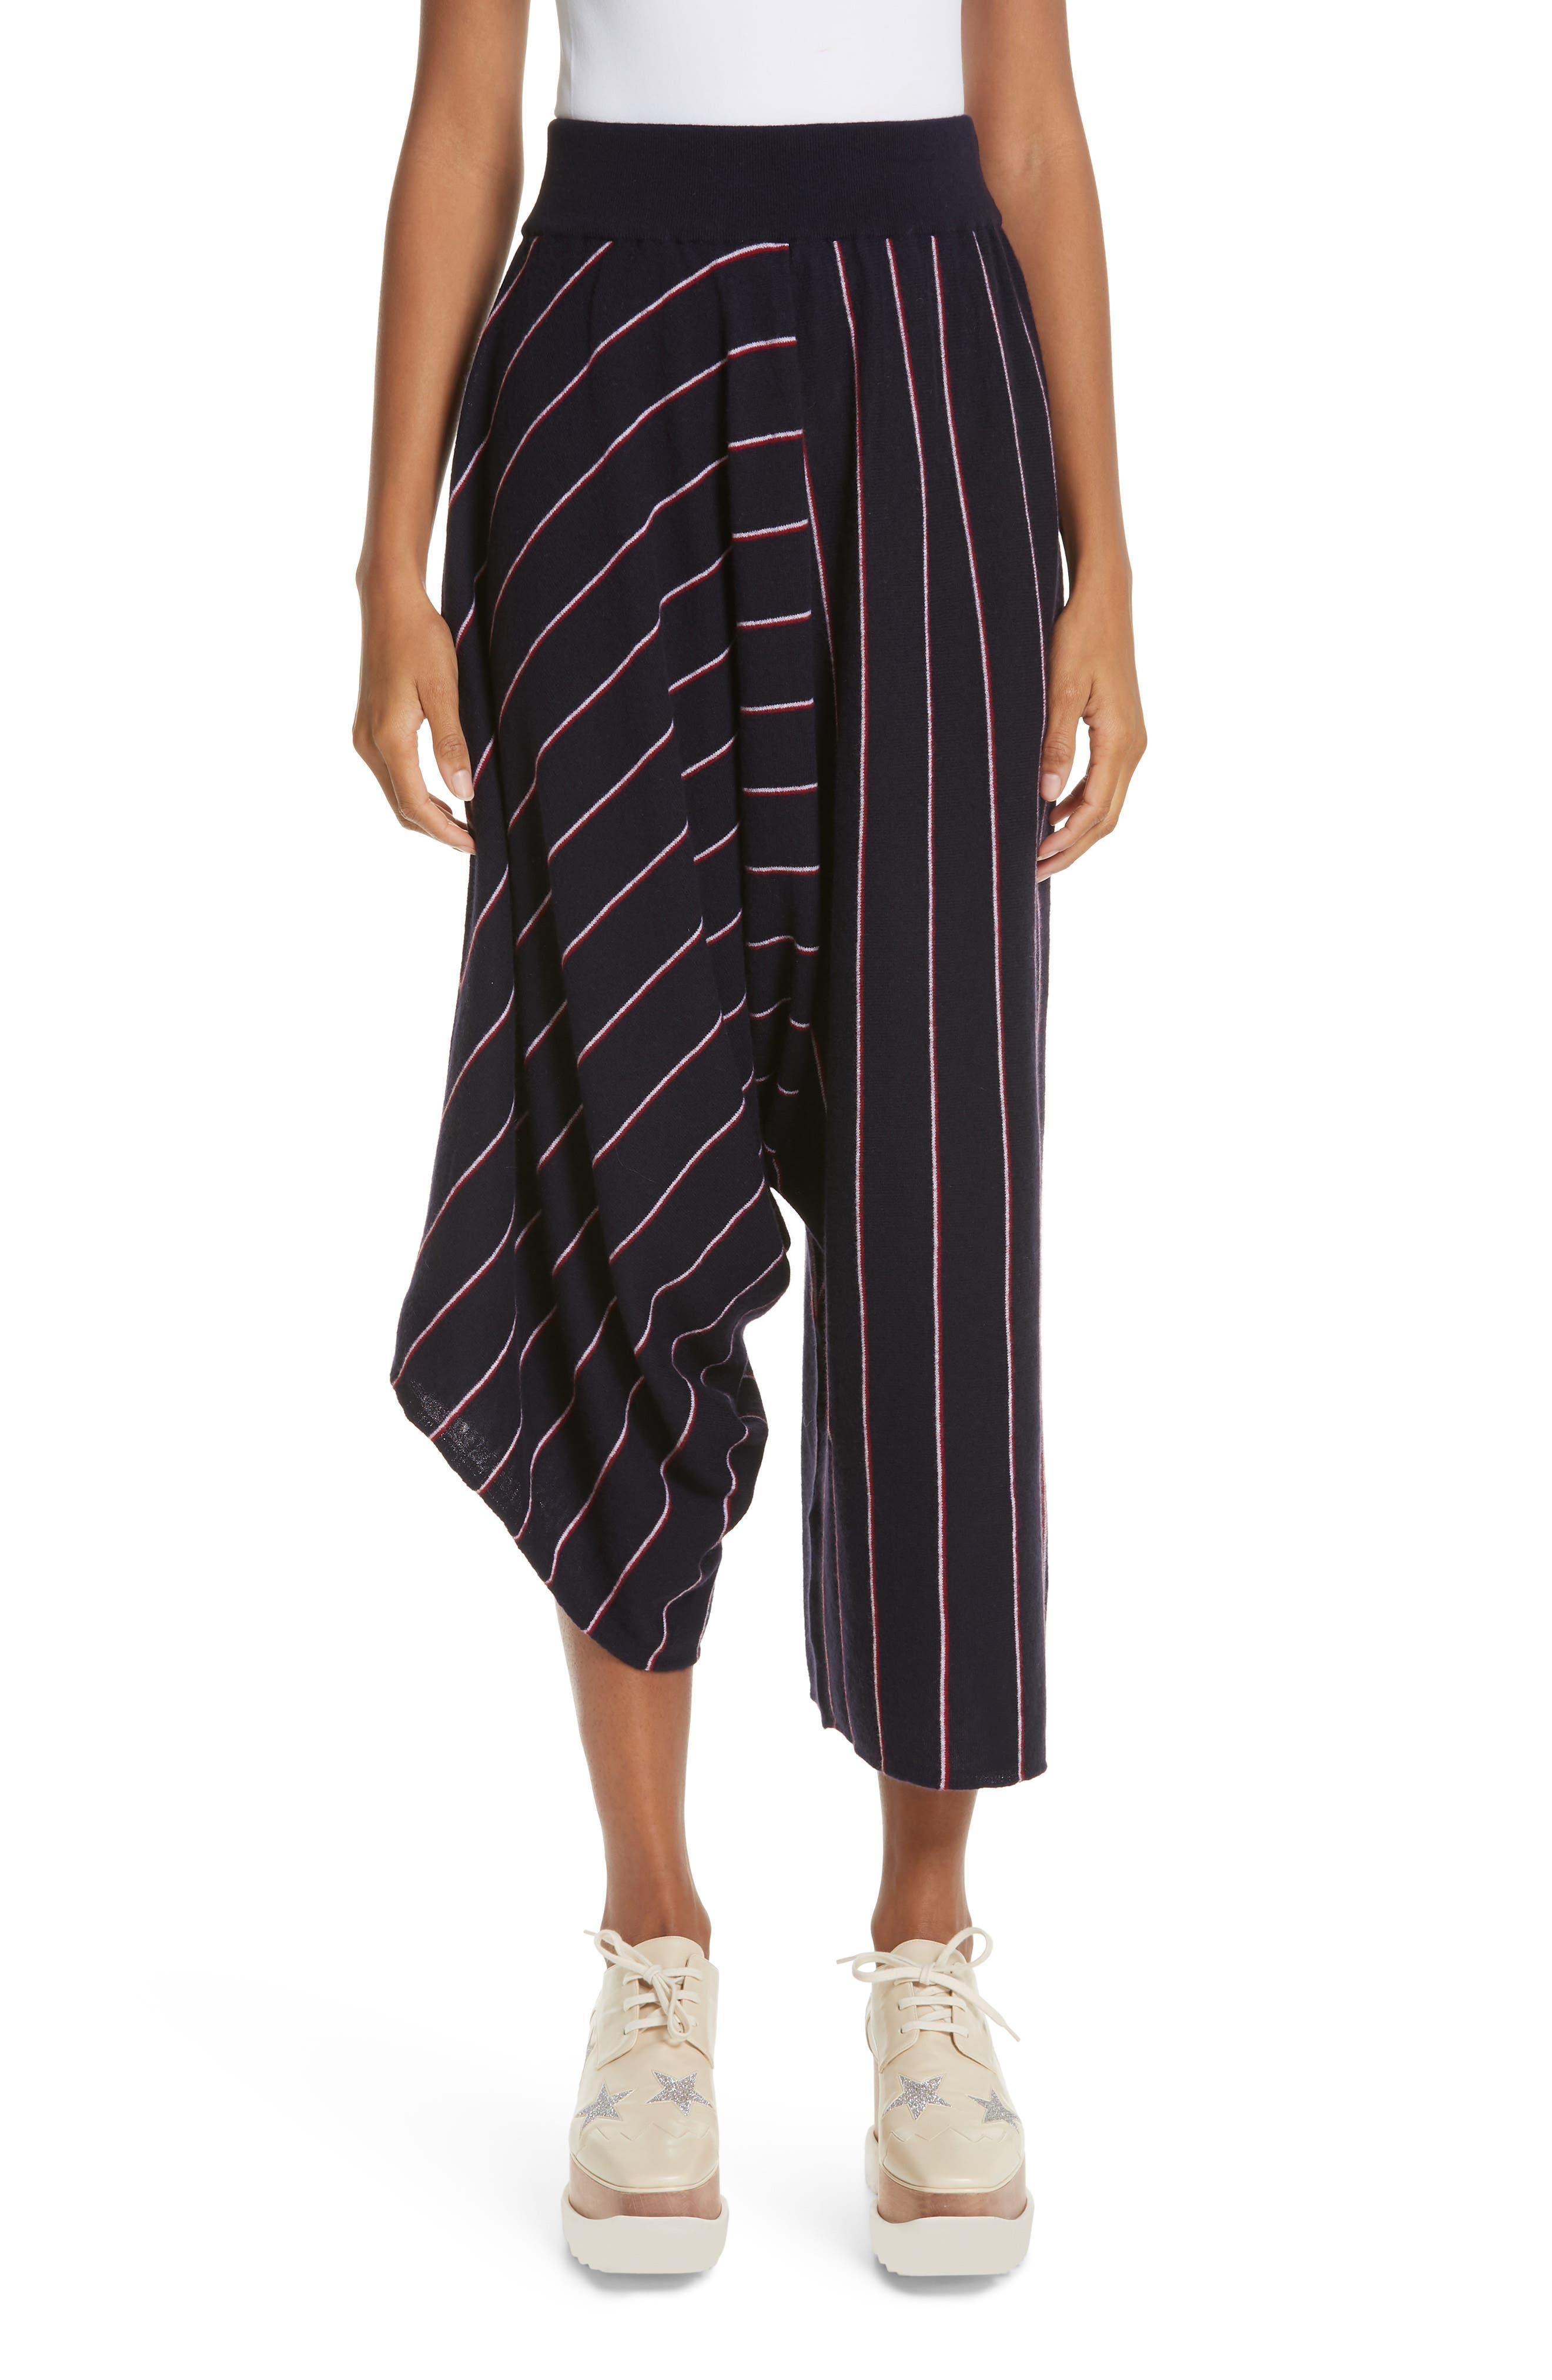 STELLA MCCARTNEY Stripe Wool Knit Crop Pants, Main, color, INK